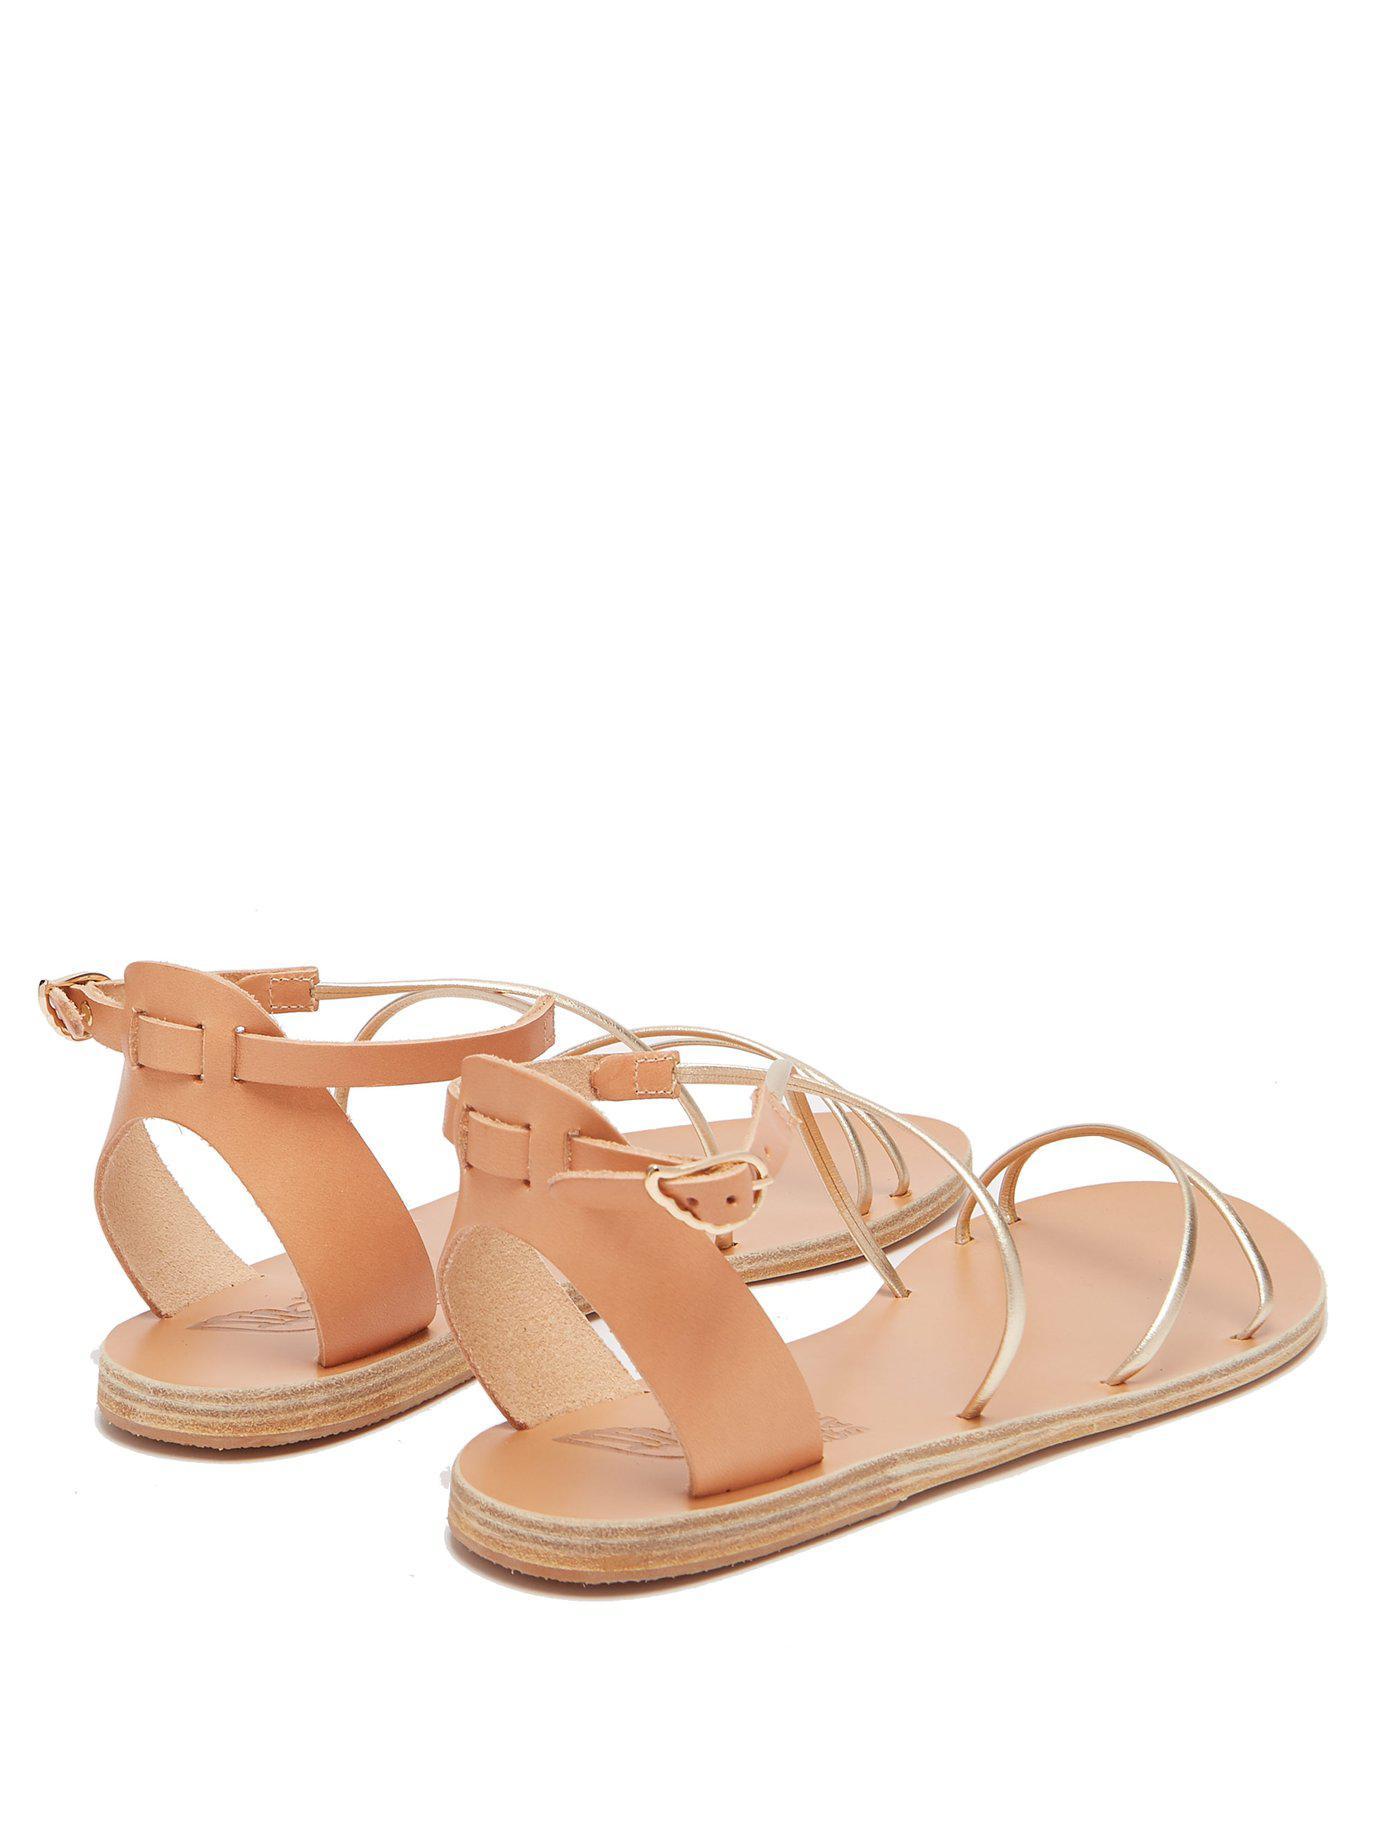 69620f018 Lyst - Ancient Greek Sandals Meloivia Metallic Leather Sandals in Metallic